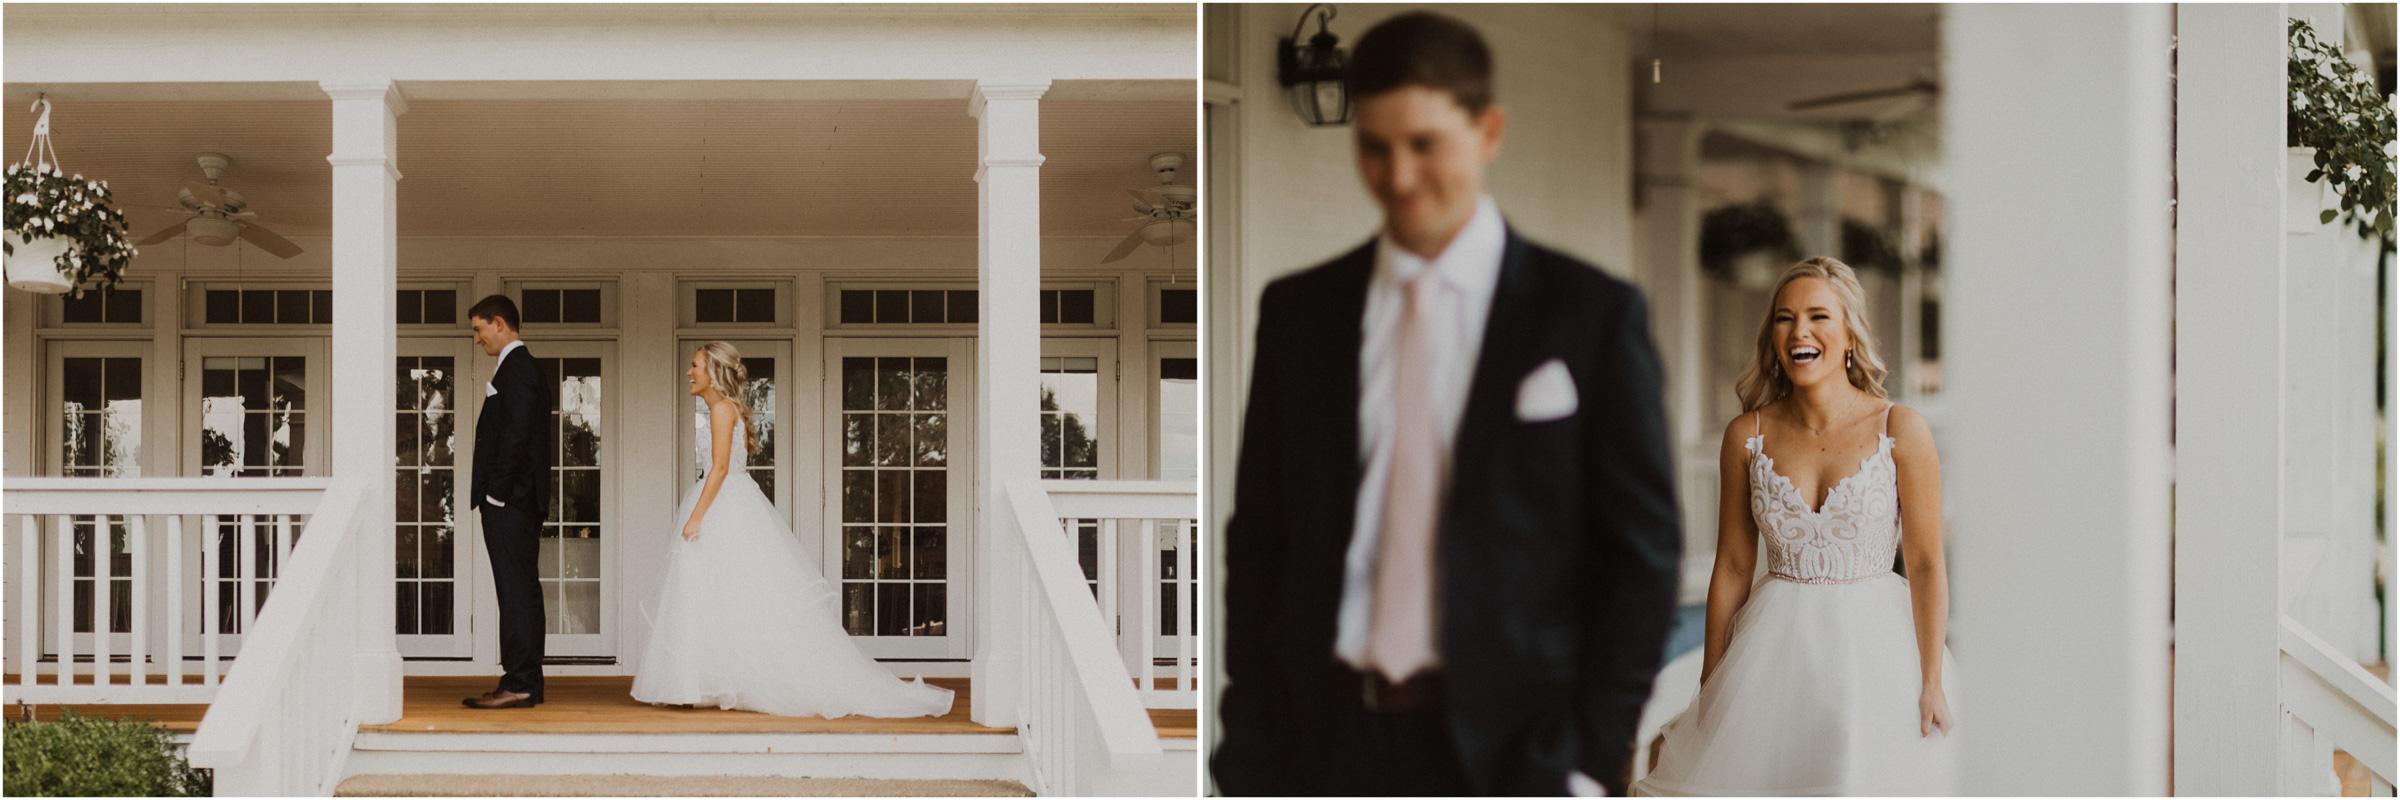 alyssa barletter photography hawthorne house summer outdoor wedding southern charm inspiration-17.jpg